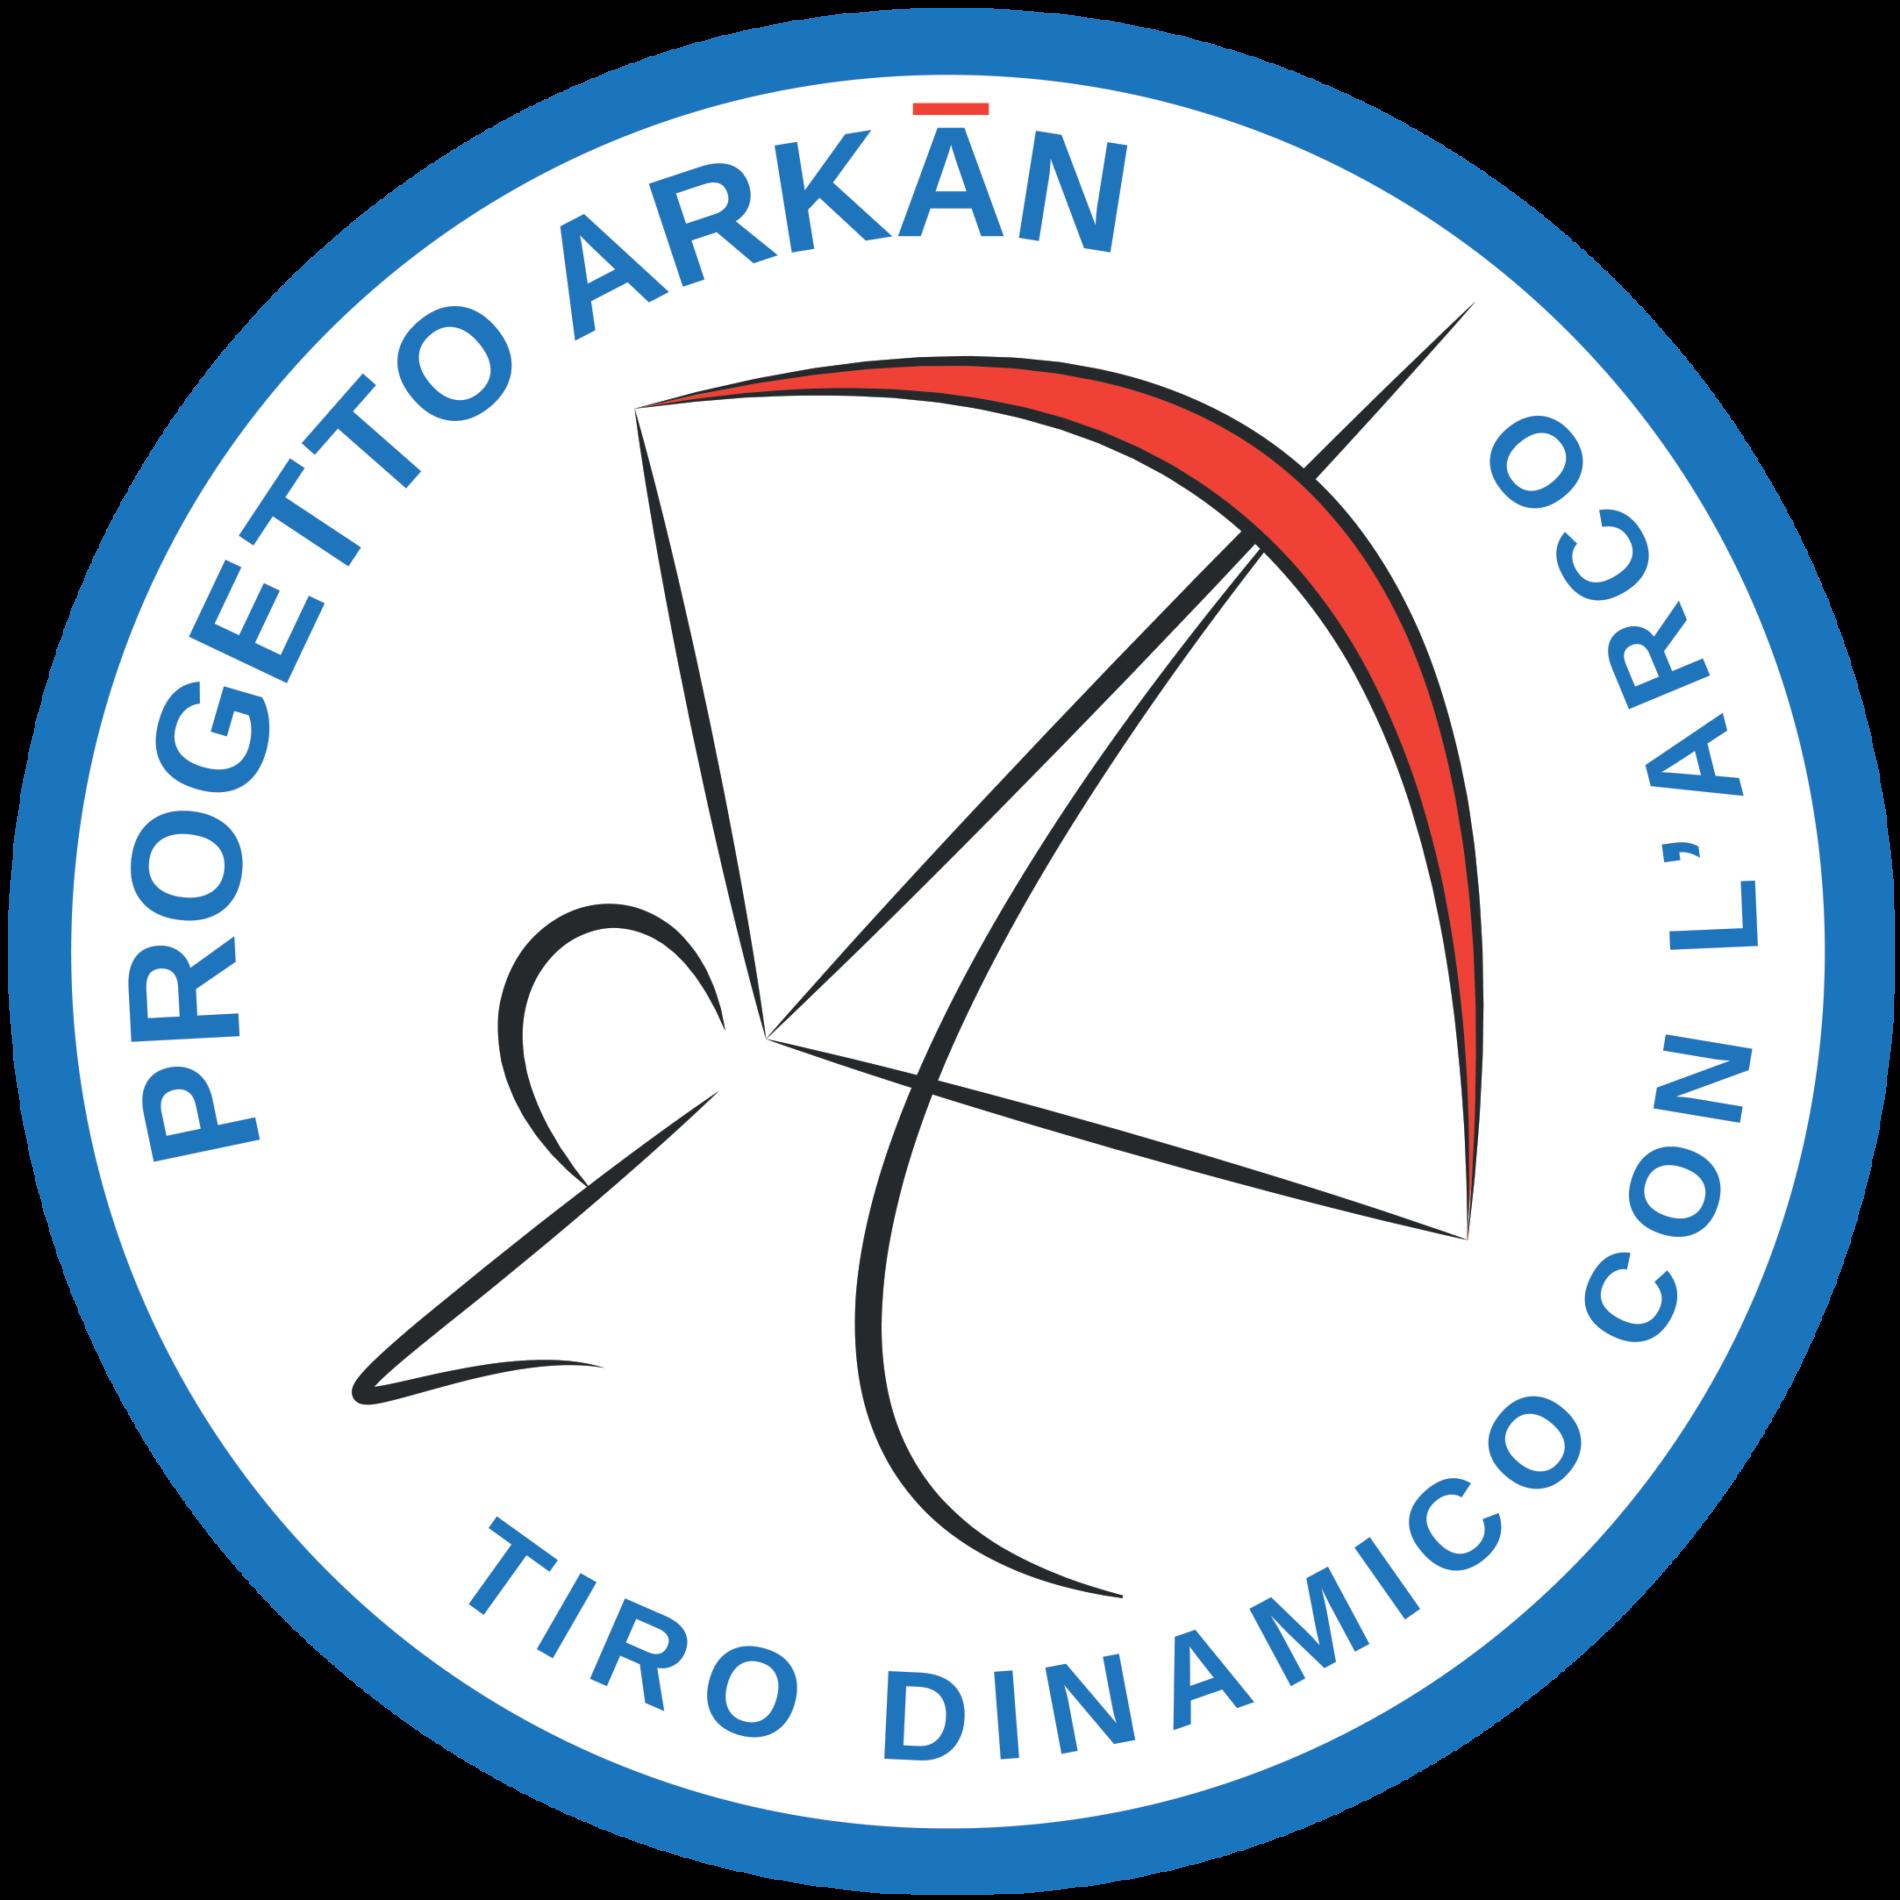 PROGETTO ARKĀN®